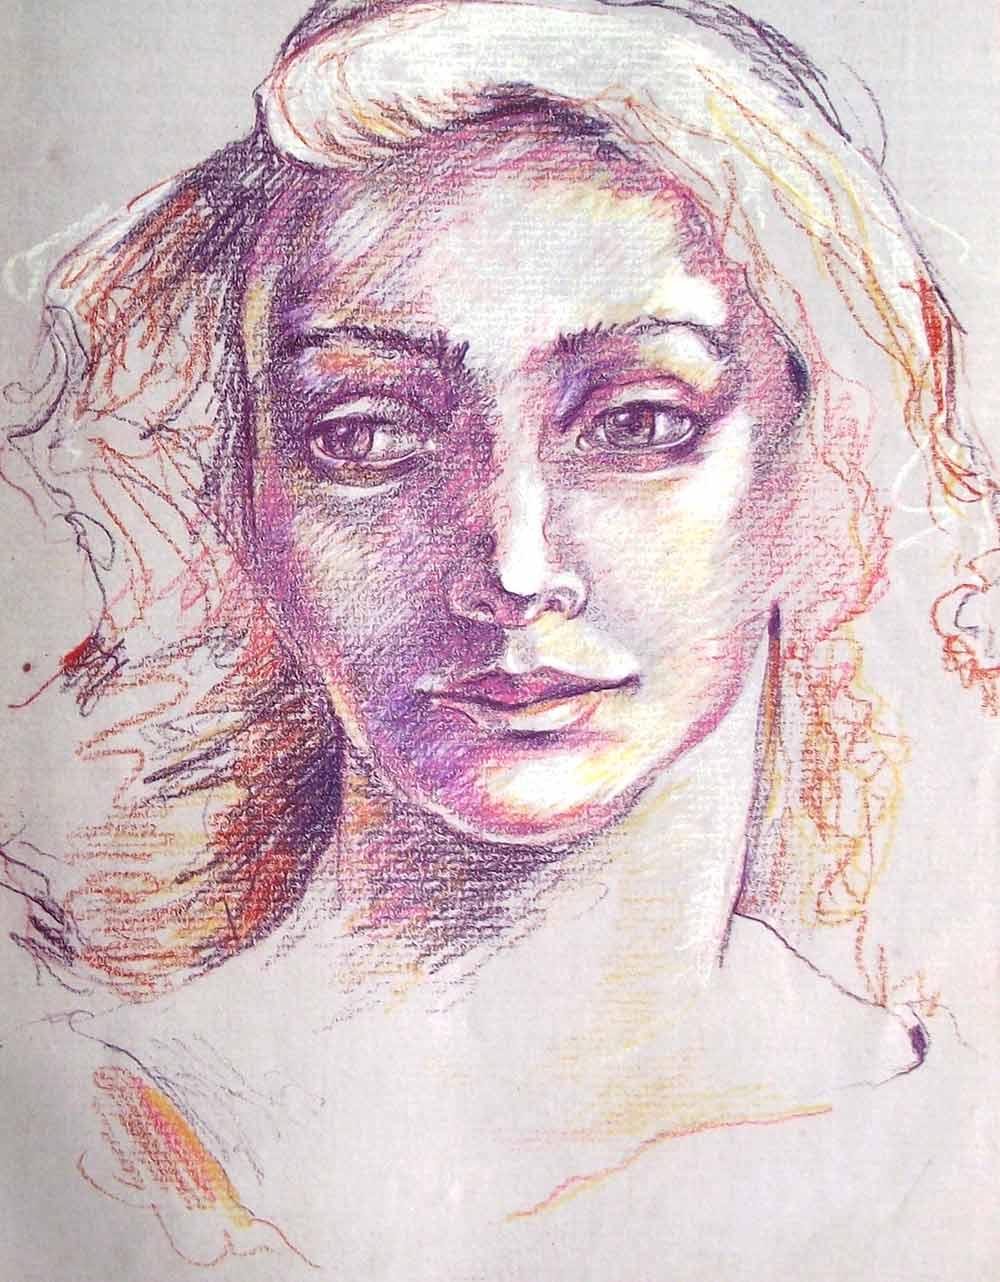 Dibujar un rostro con lpices de colores Paso a paso